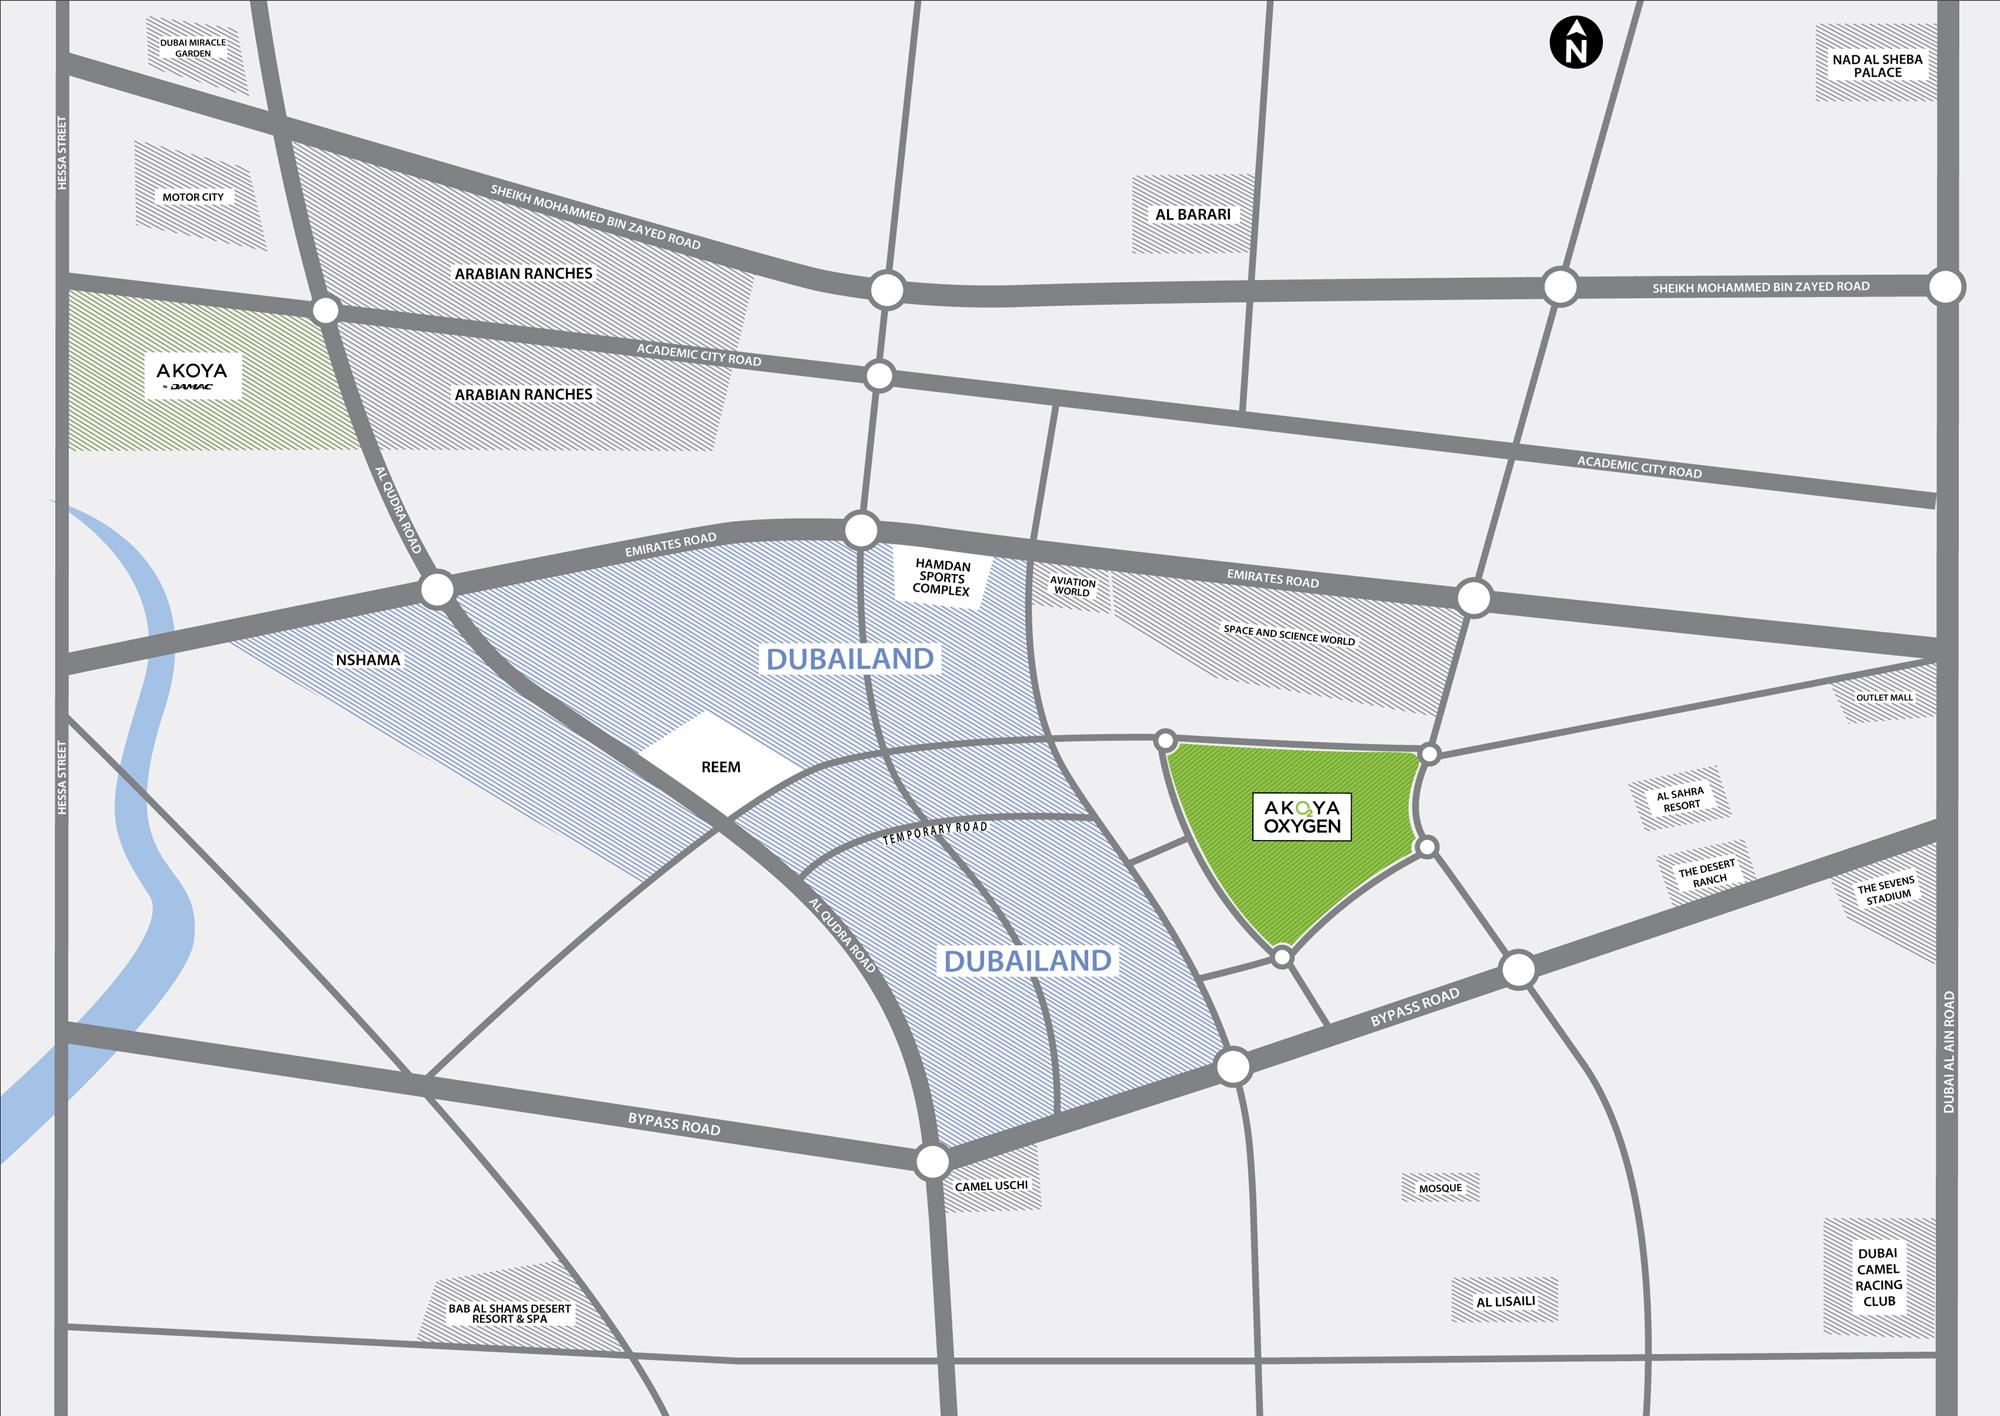 Tower 108 -  Location Plan